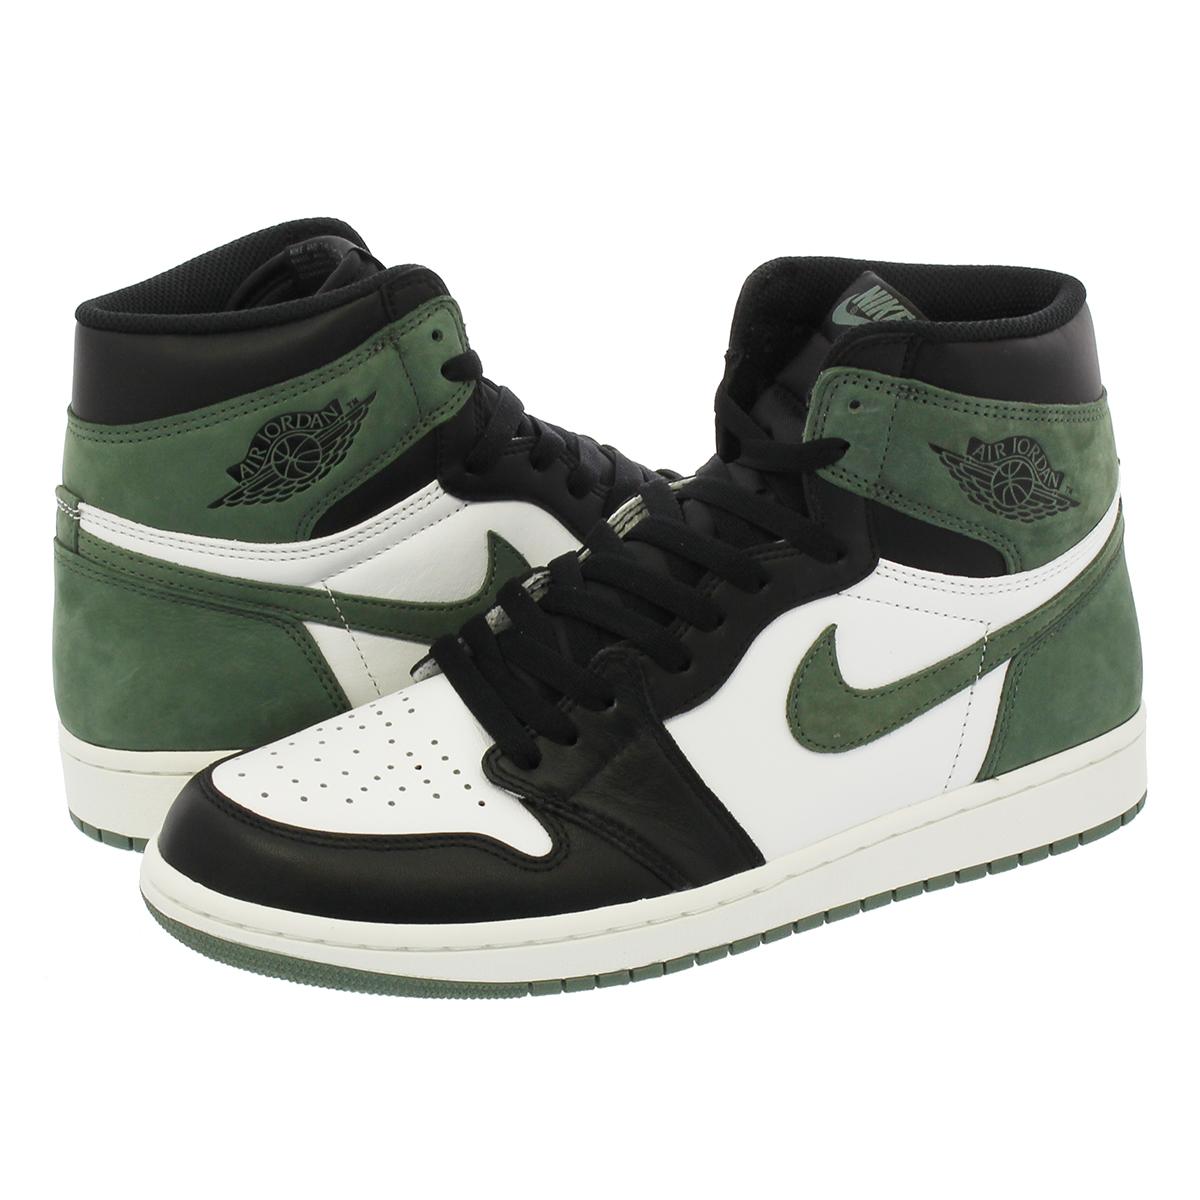 watch 9ceb7 a5c1b NIKE AIR JORDAN 1 RETRO HIGH OG Nike Air Jordan 1 nostalgic high OG  WHITE/BLACK/CLAY GREEN